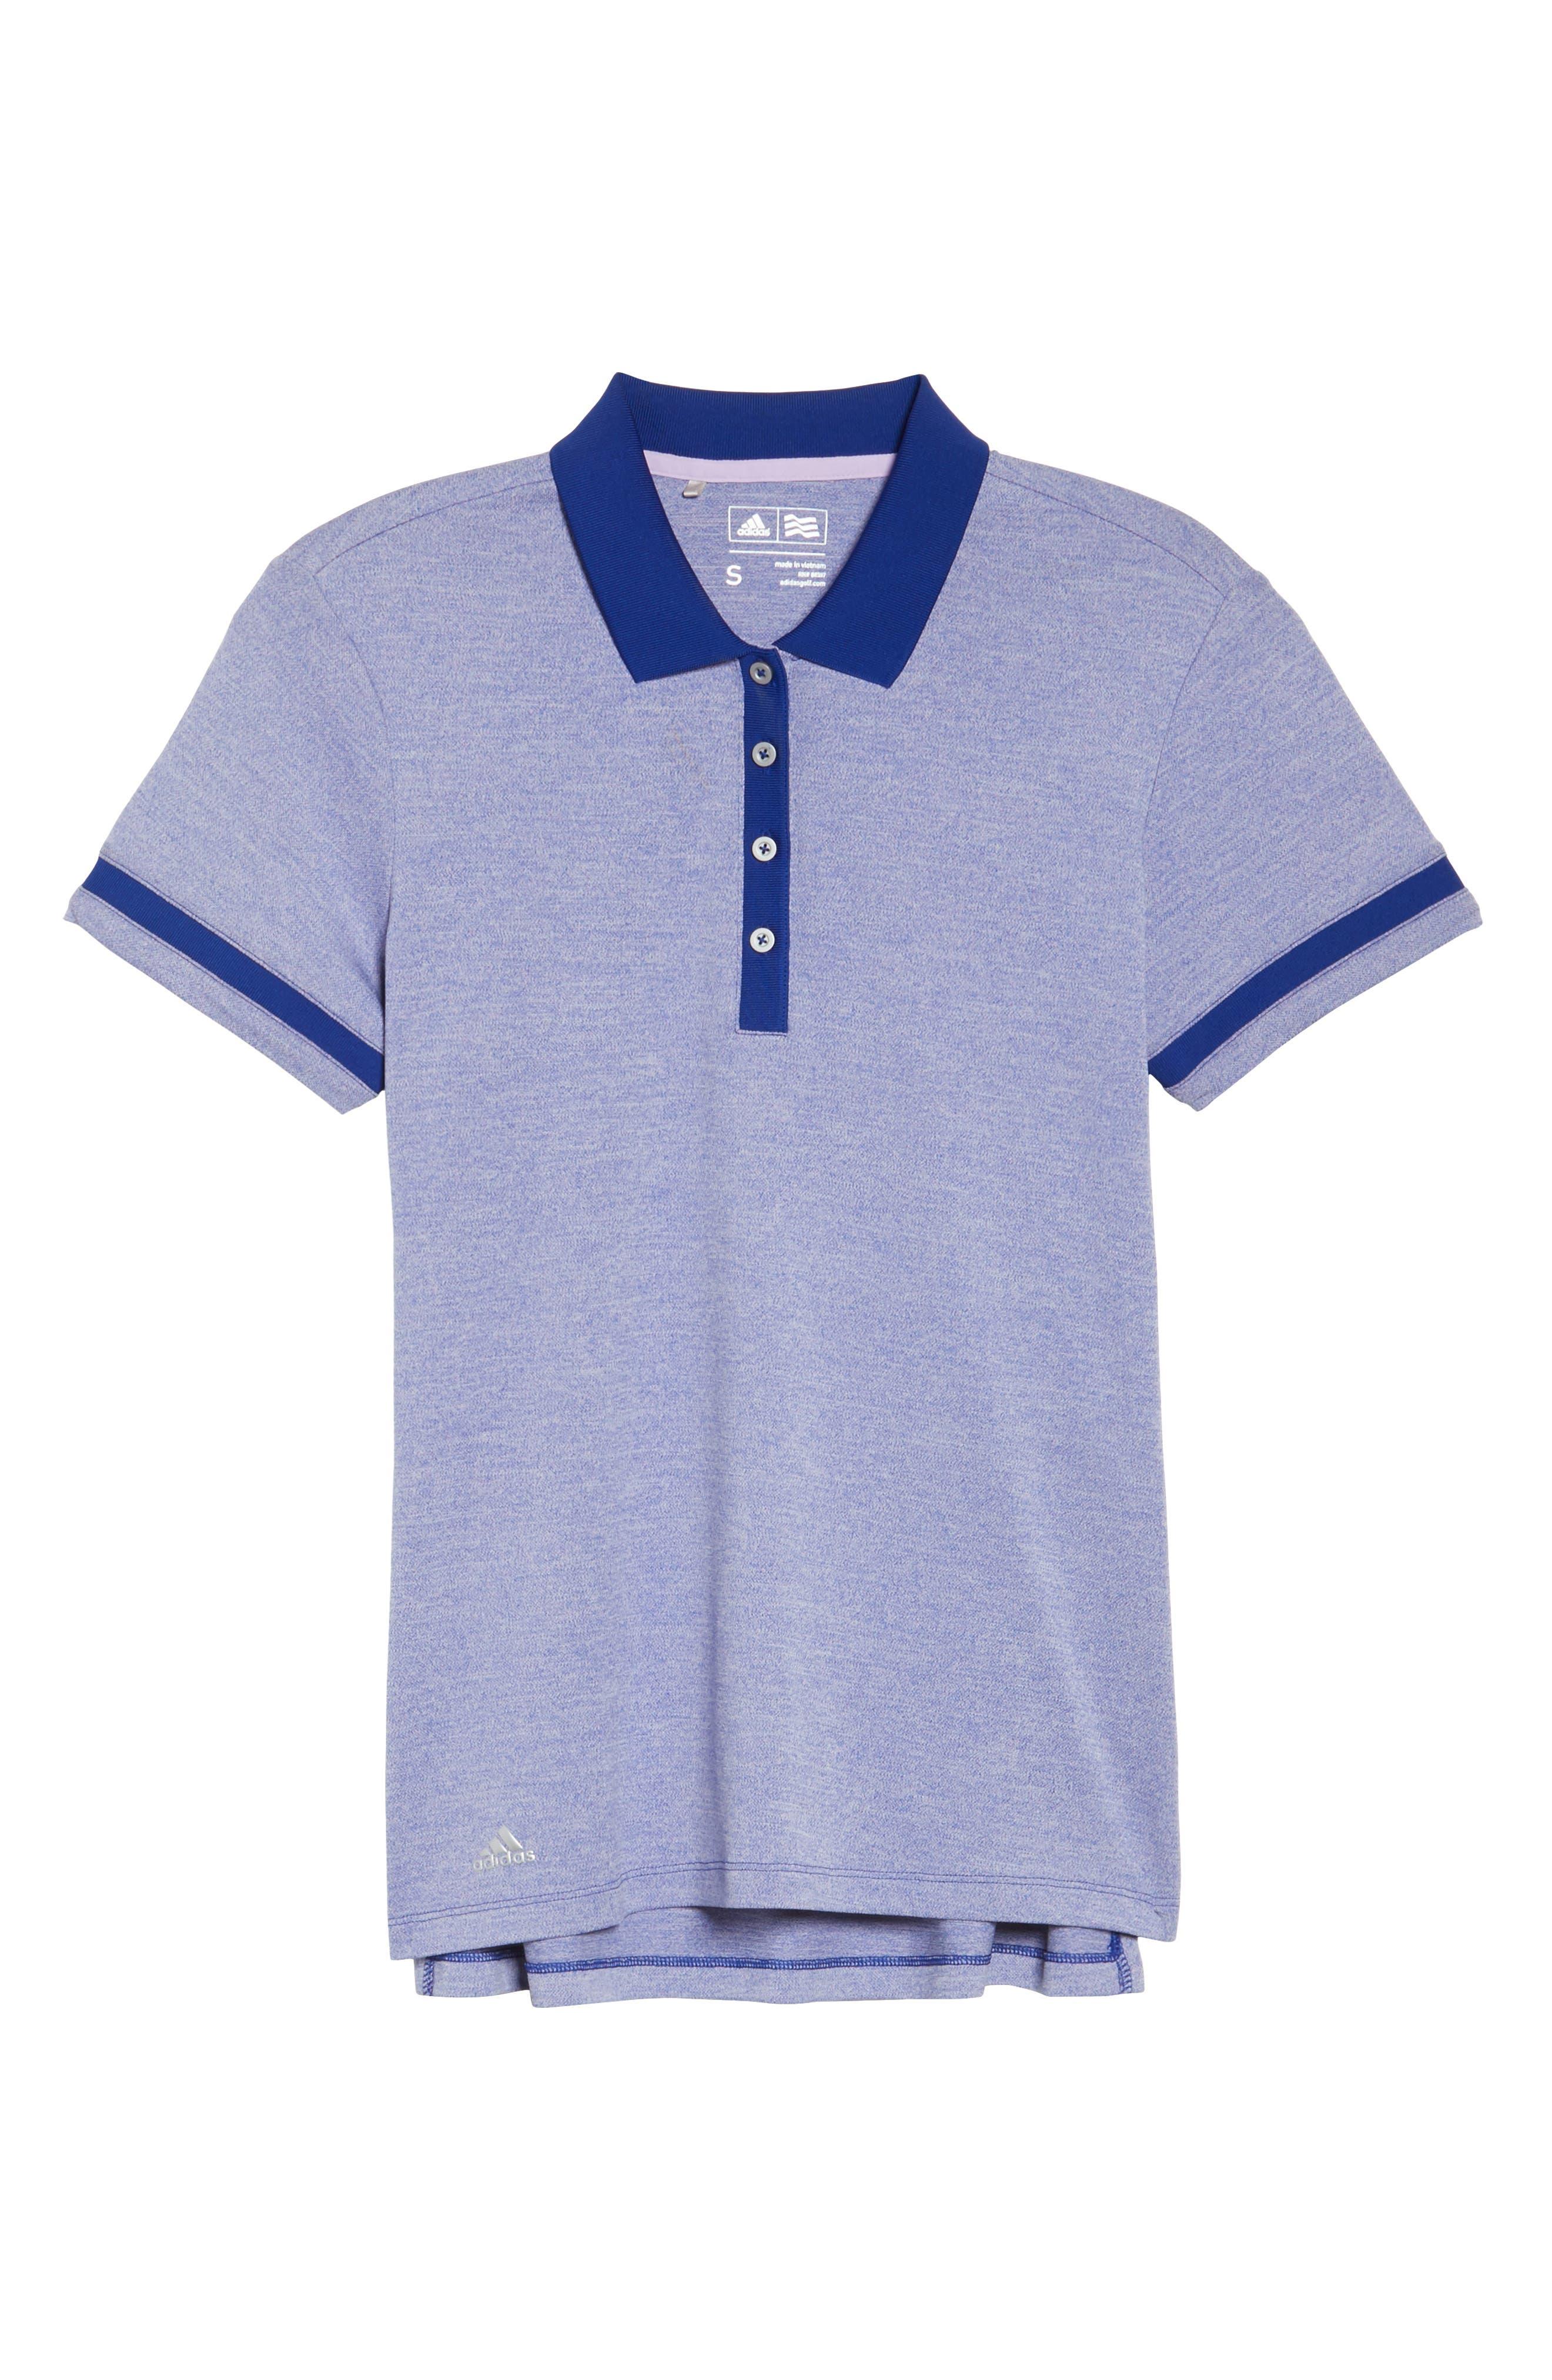 Piqué Knit Golf Polo,                             Alternate thumbnail 7, color,                             404